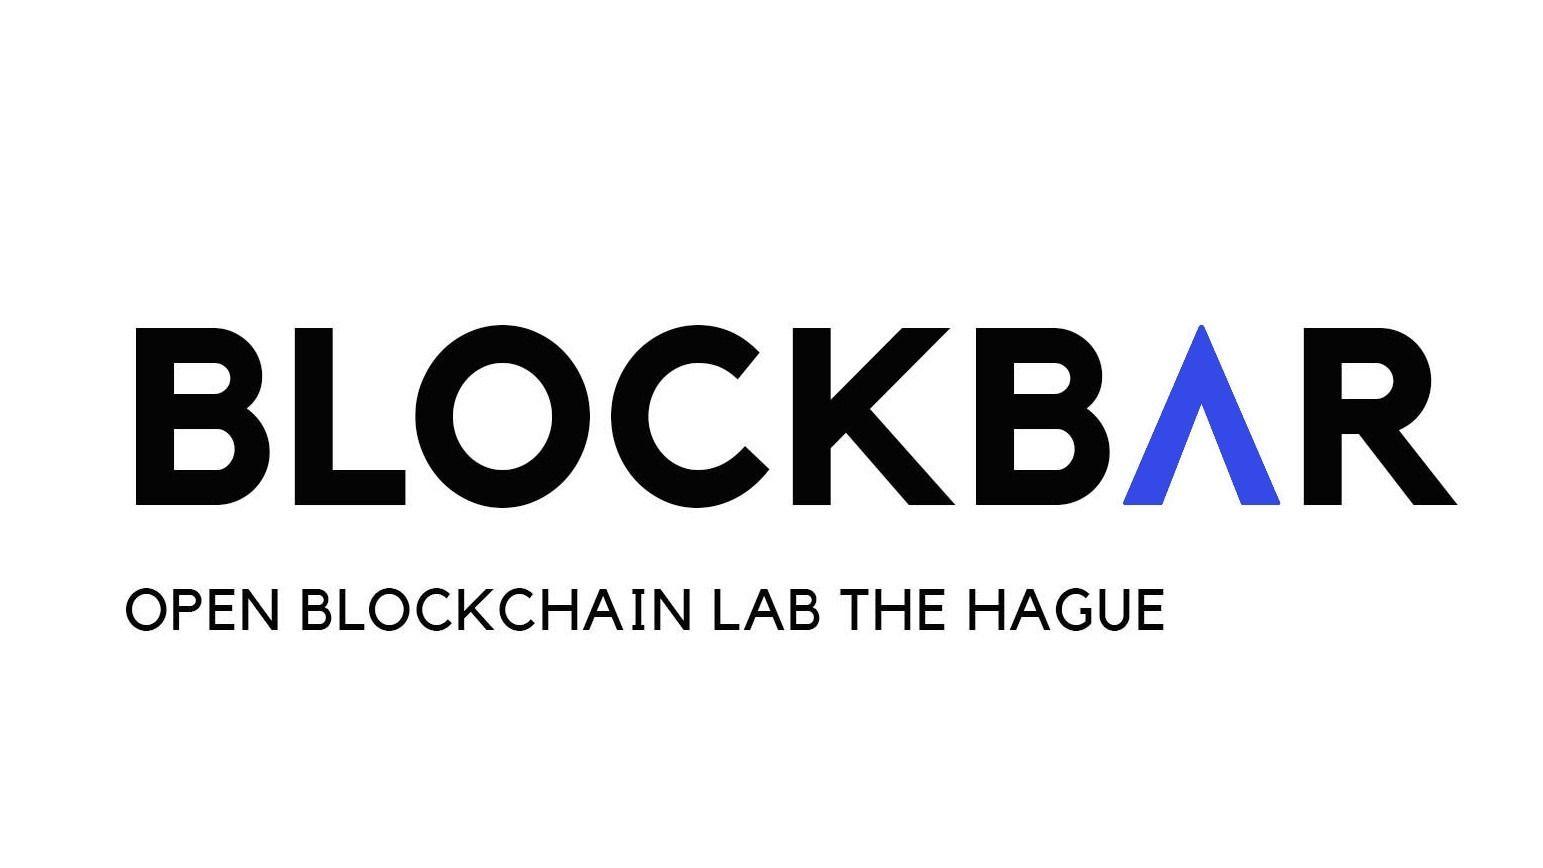 Blockbar | Blockchain Lab Den Haag